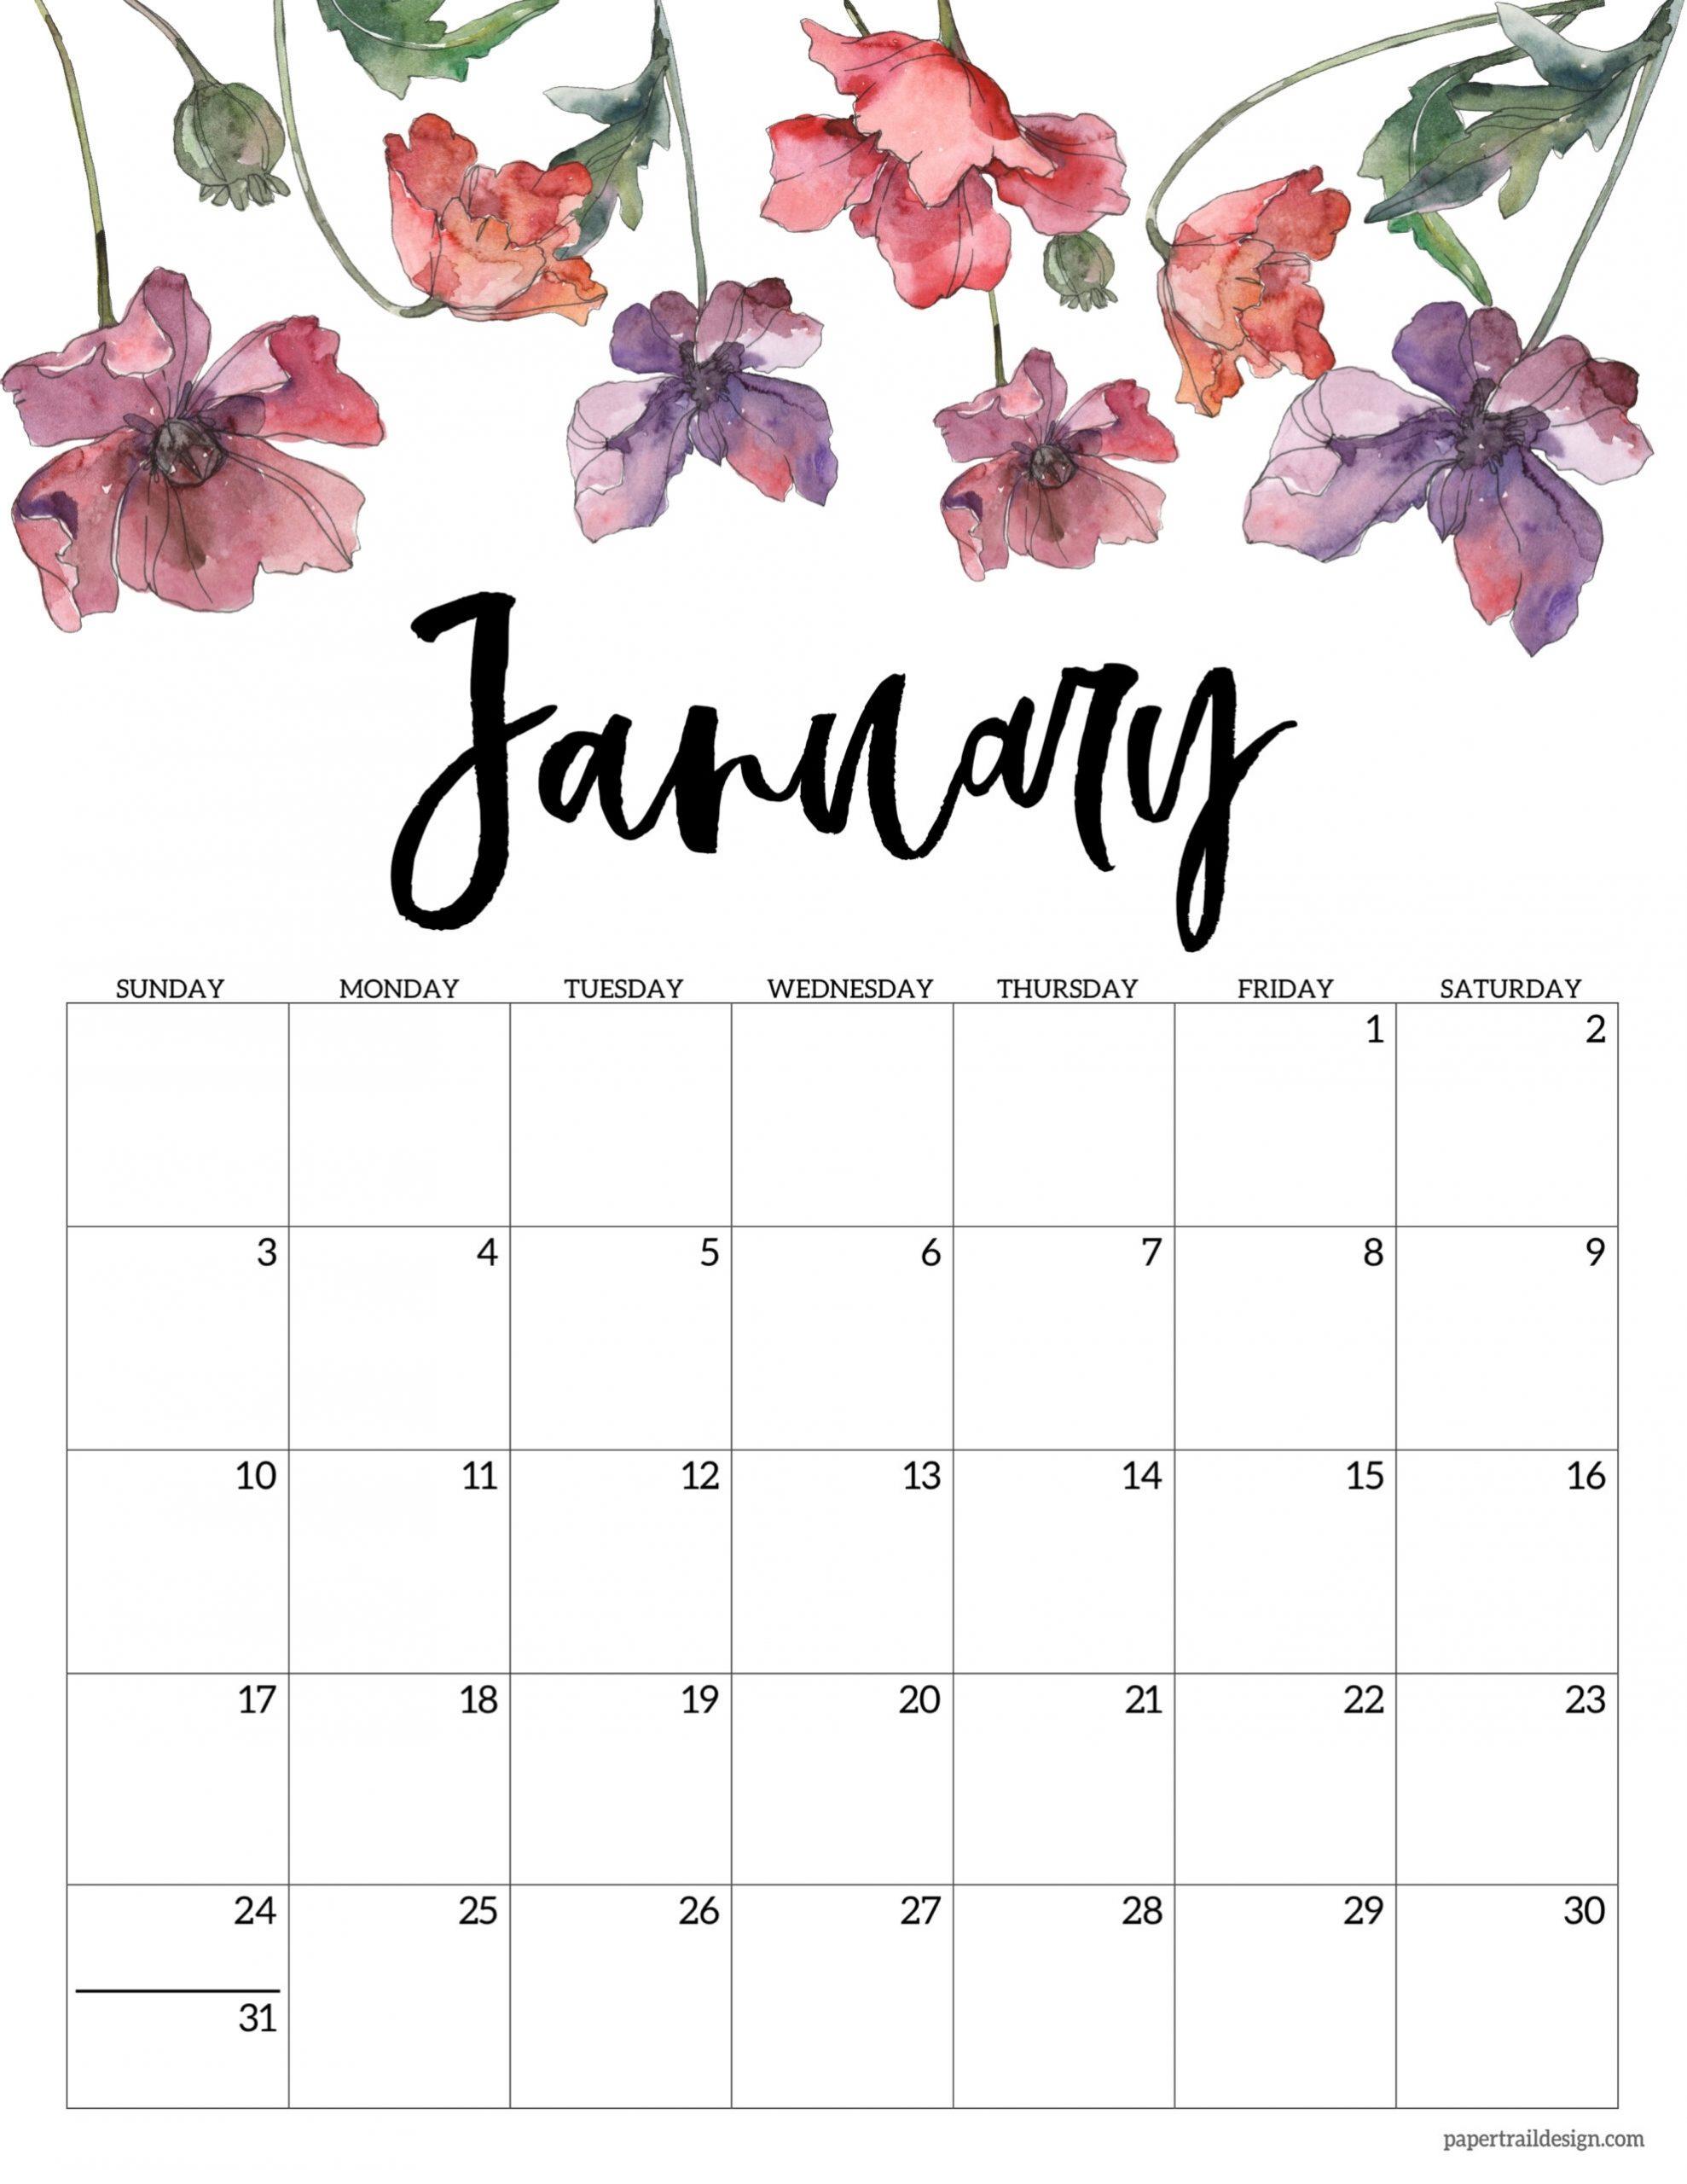 2021 Free Printable Calendar - Floral | Paper Trail Design